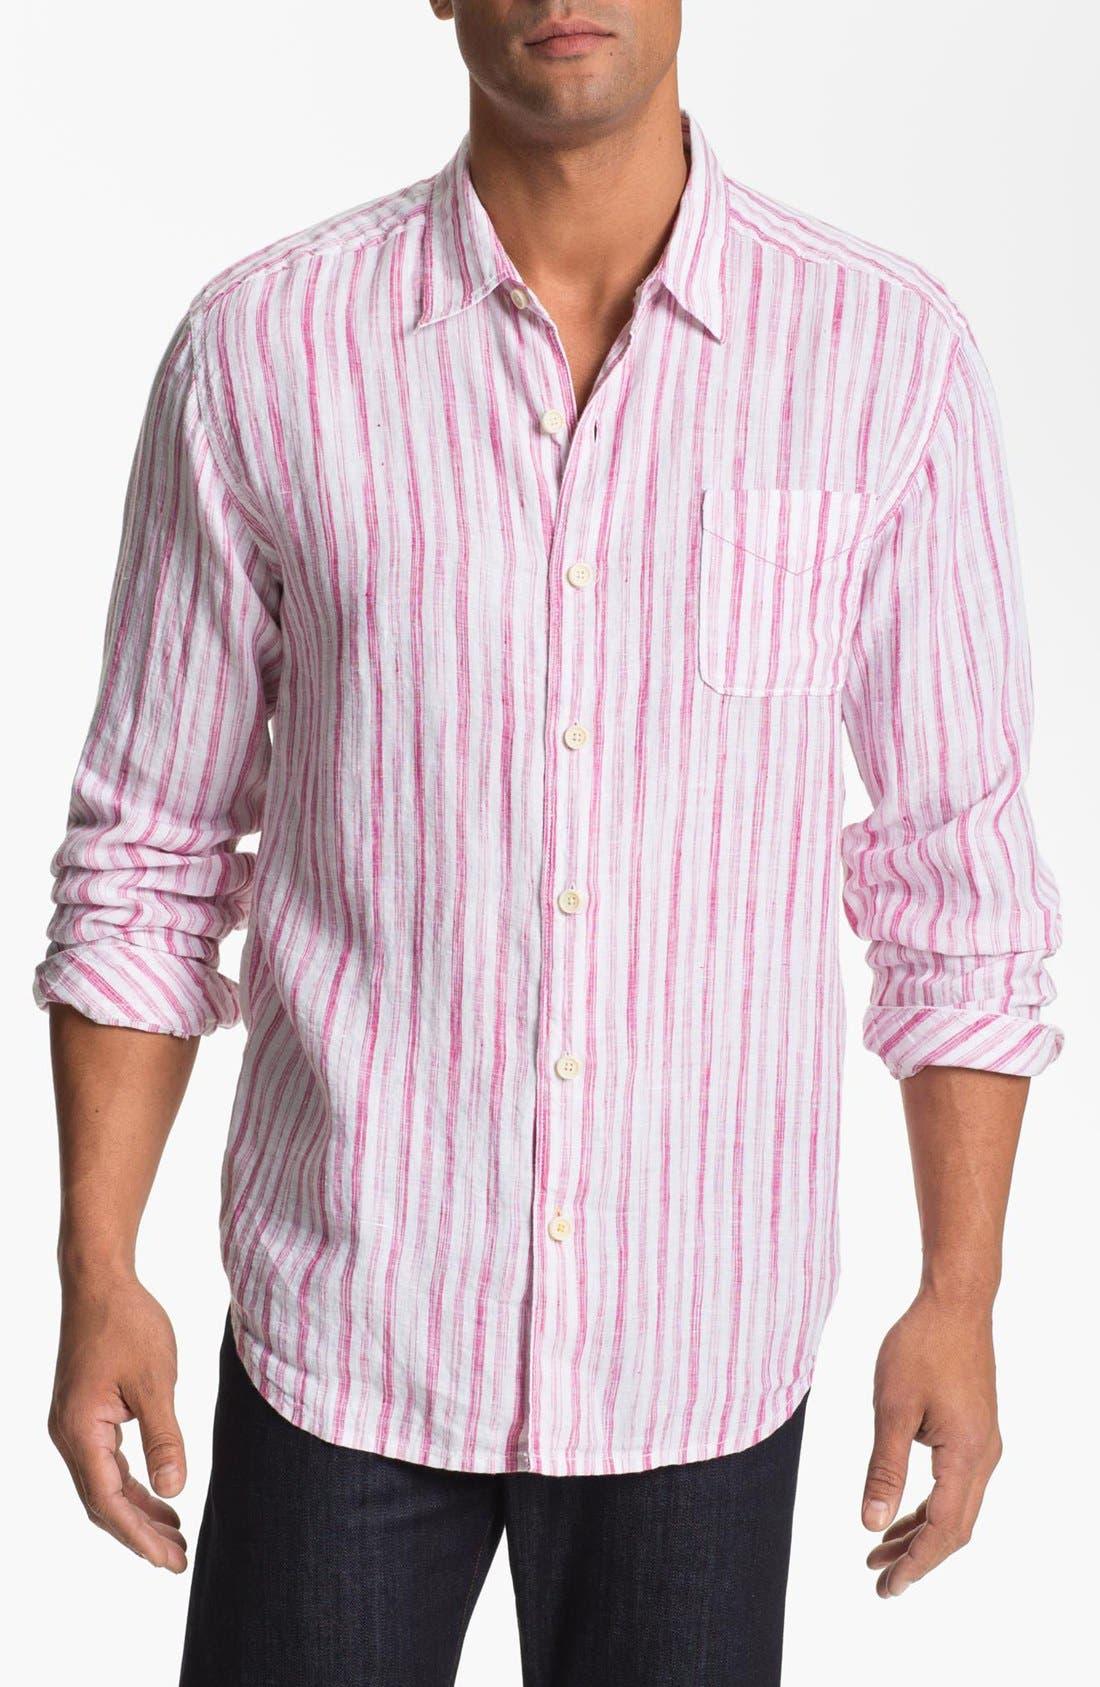 Main Image - Tommy Bahama 'Academy' Regular Fit Sport Shirt (Big & Tall)